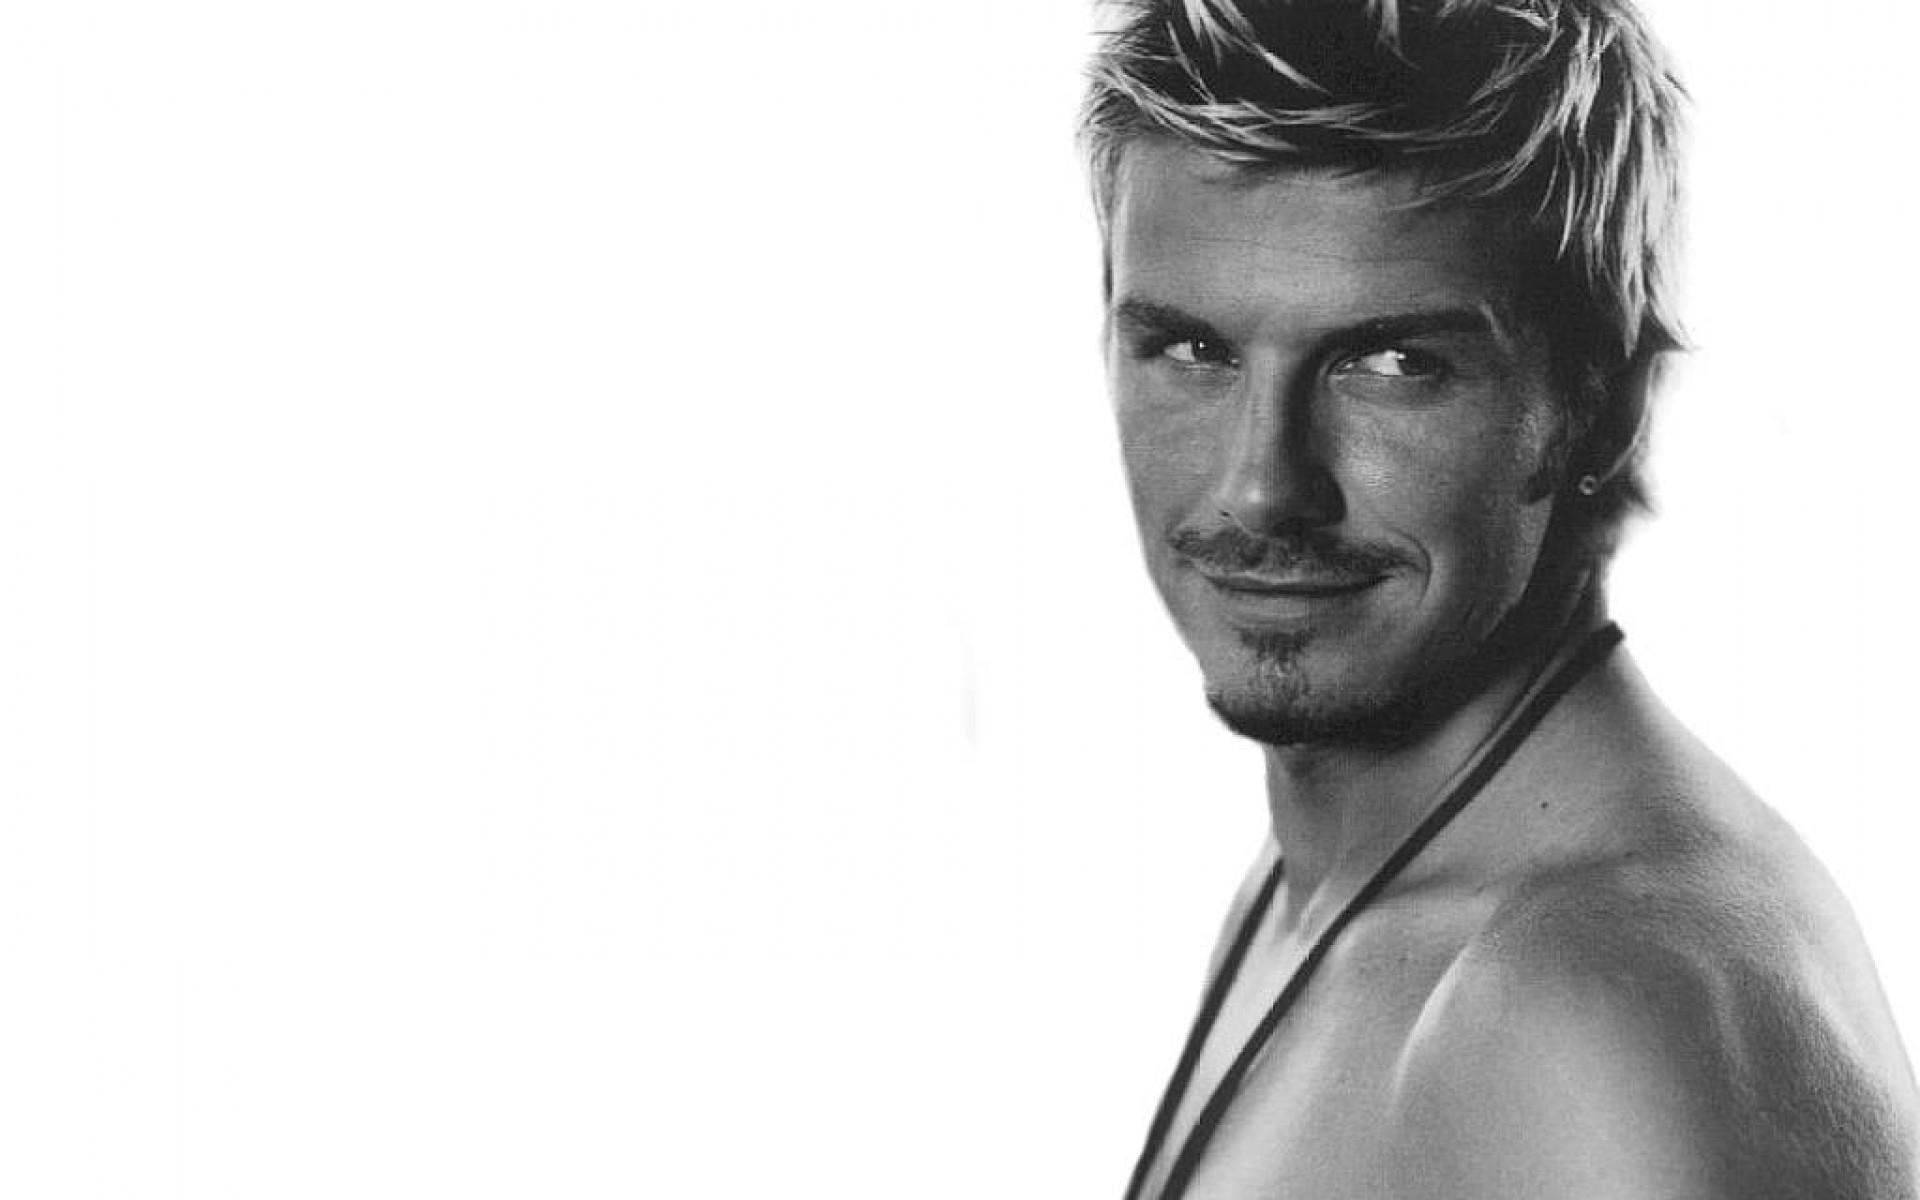 Res: 1920x1200, Black And White David Beckham Football Wallpaper Pics Wallpaper